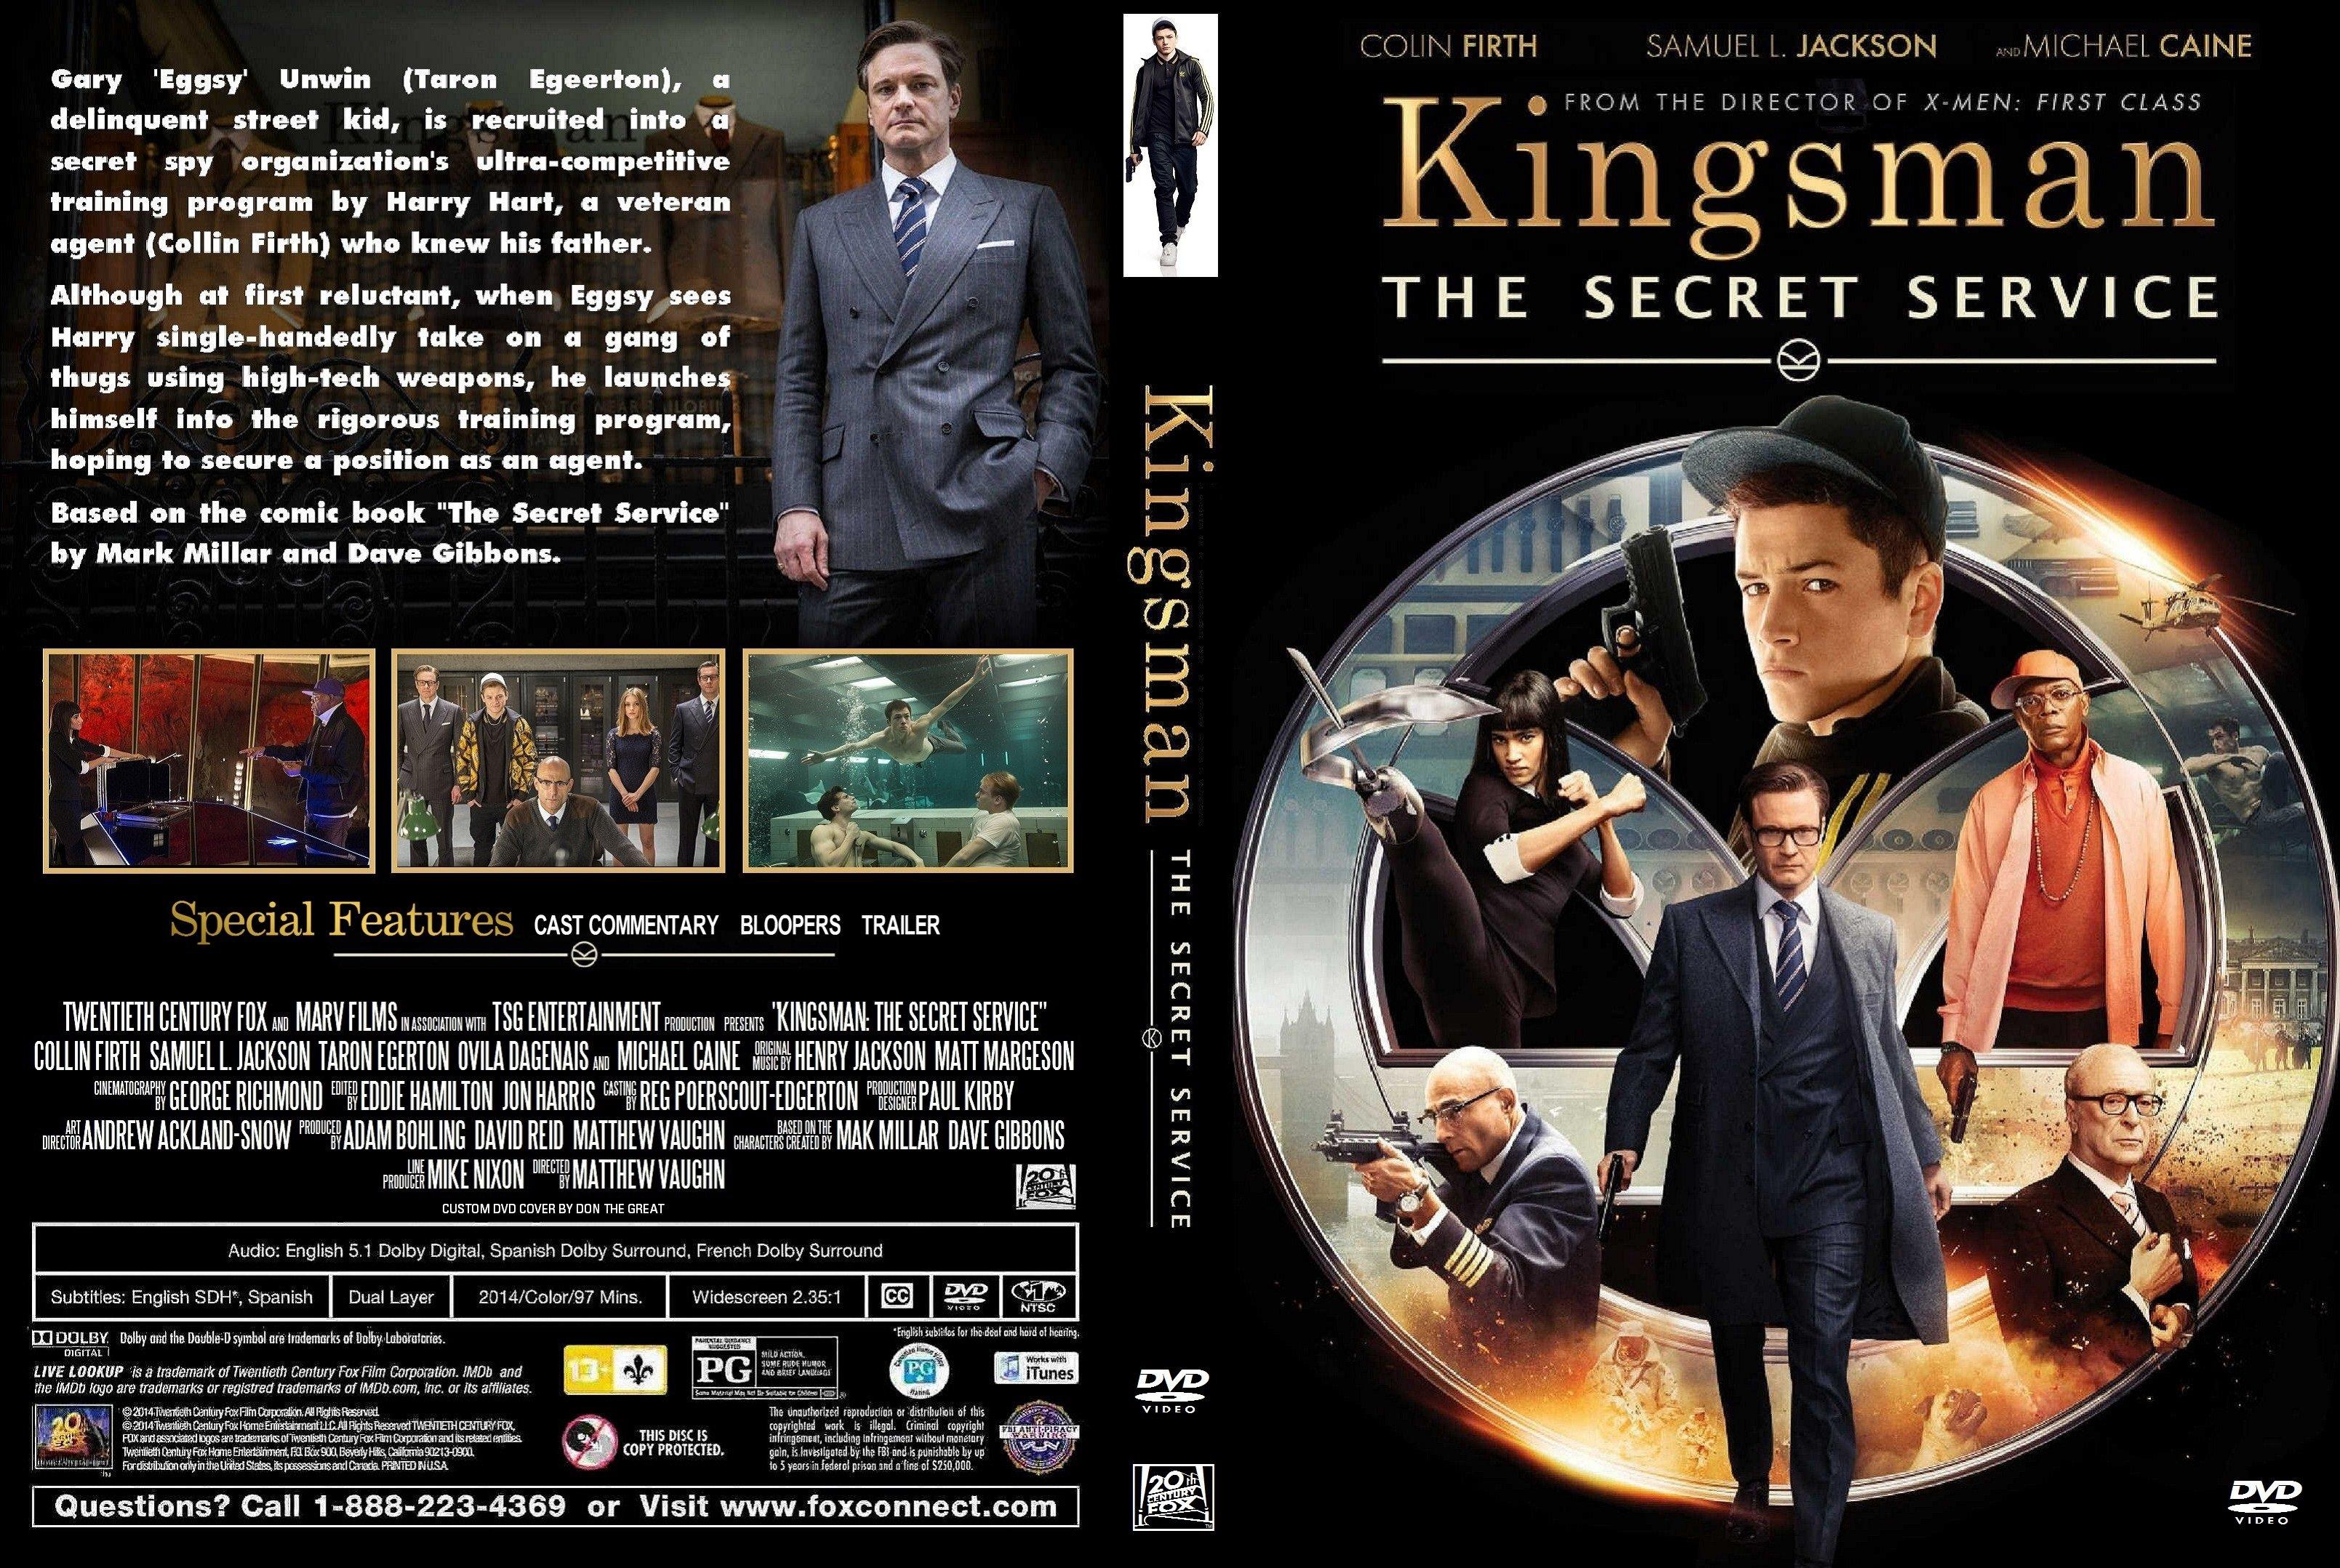 Kingsman Secret Service Sci Fi Action Adventure Comedy Crime Kingsman Secret Service Poster Wallpaper 3218x2157 771231 Wallpaperup